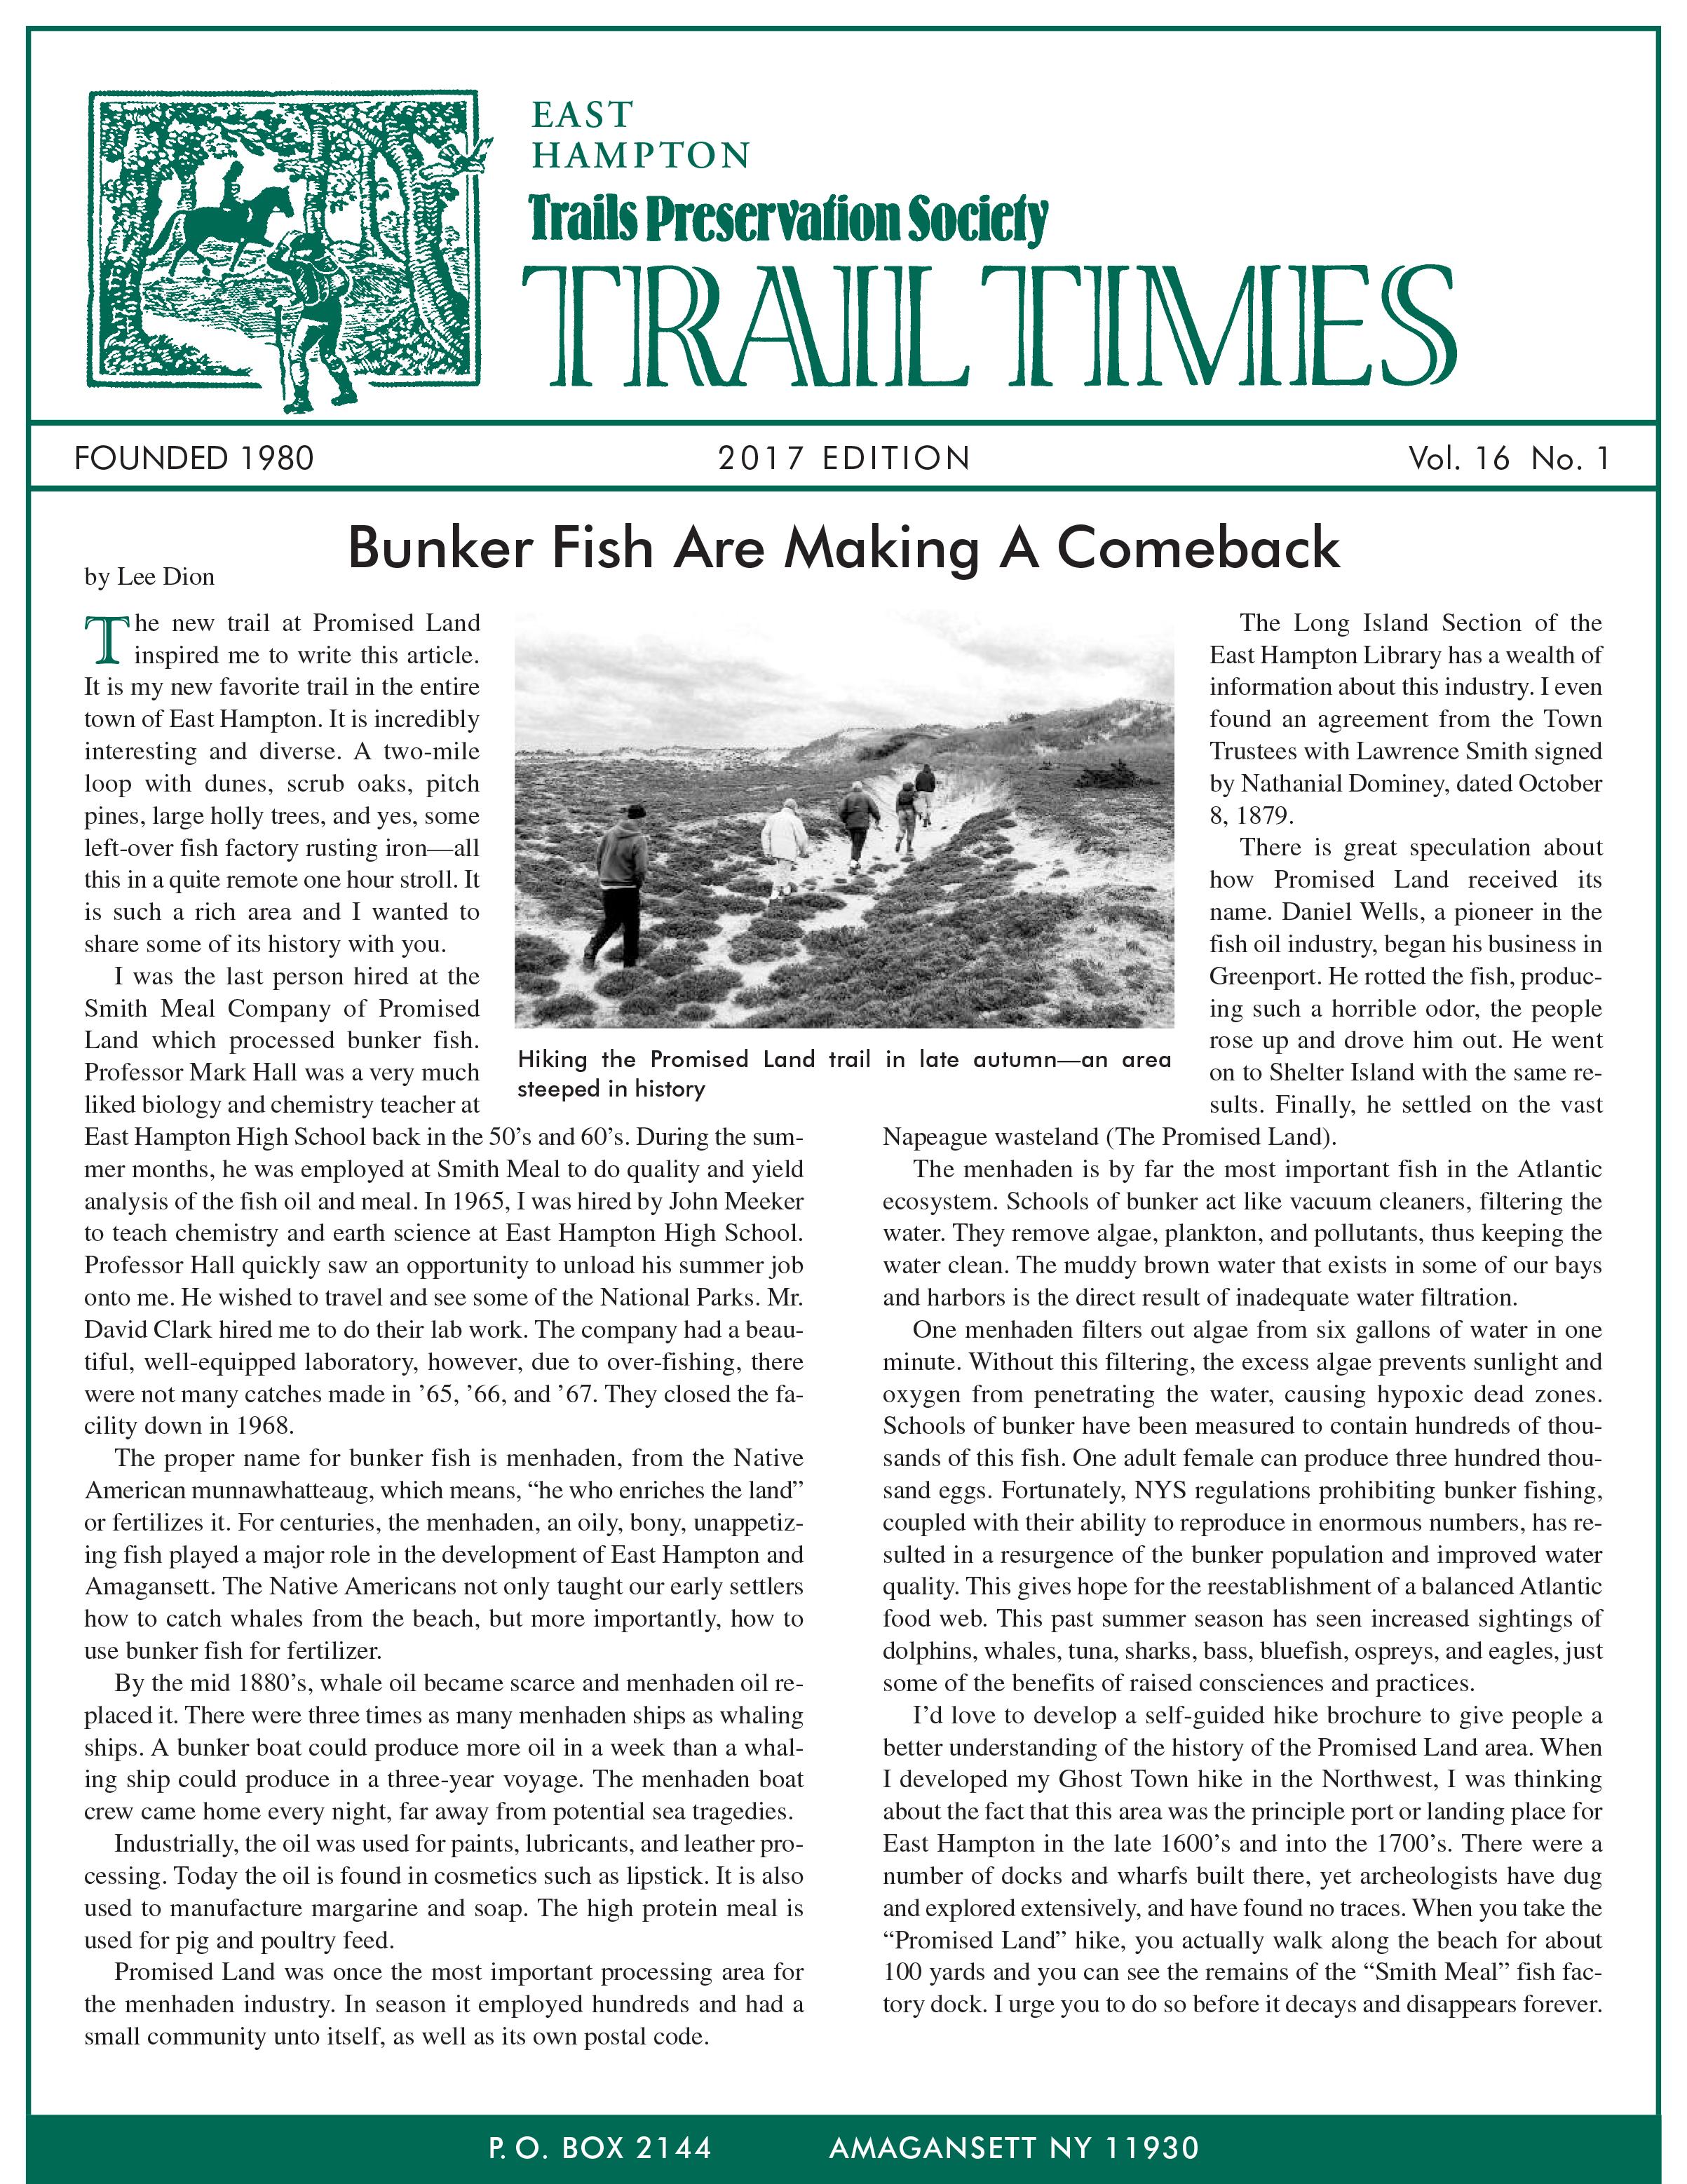 EHTP_Trail_Times_01_2018-1.jpg